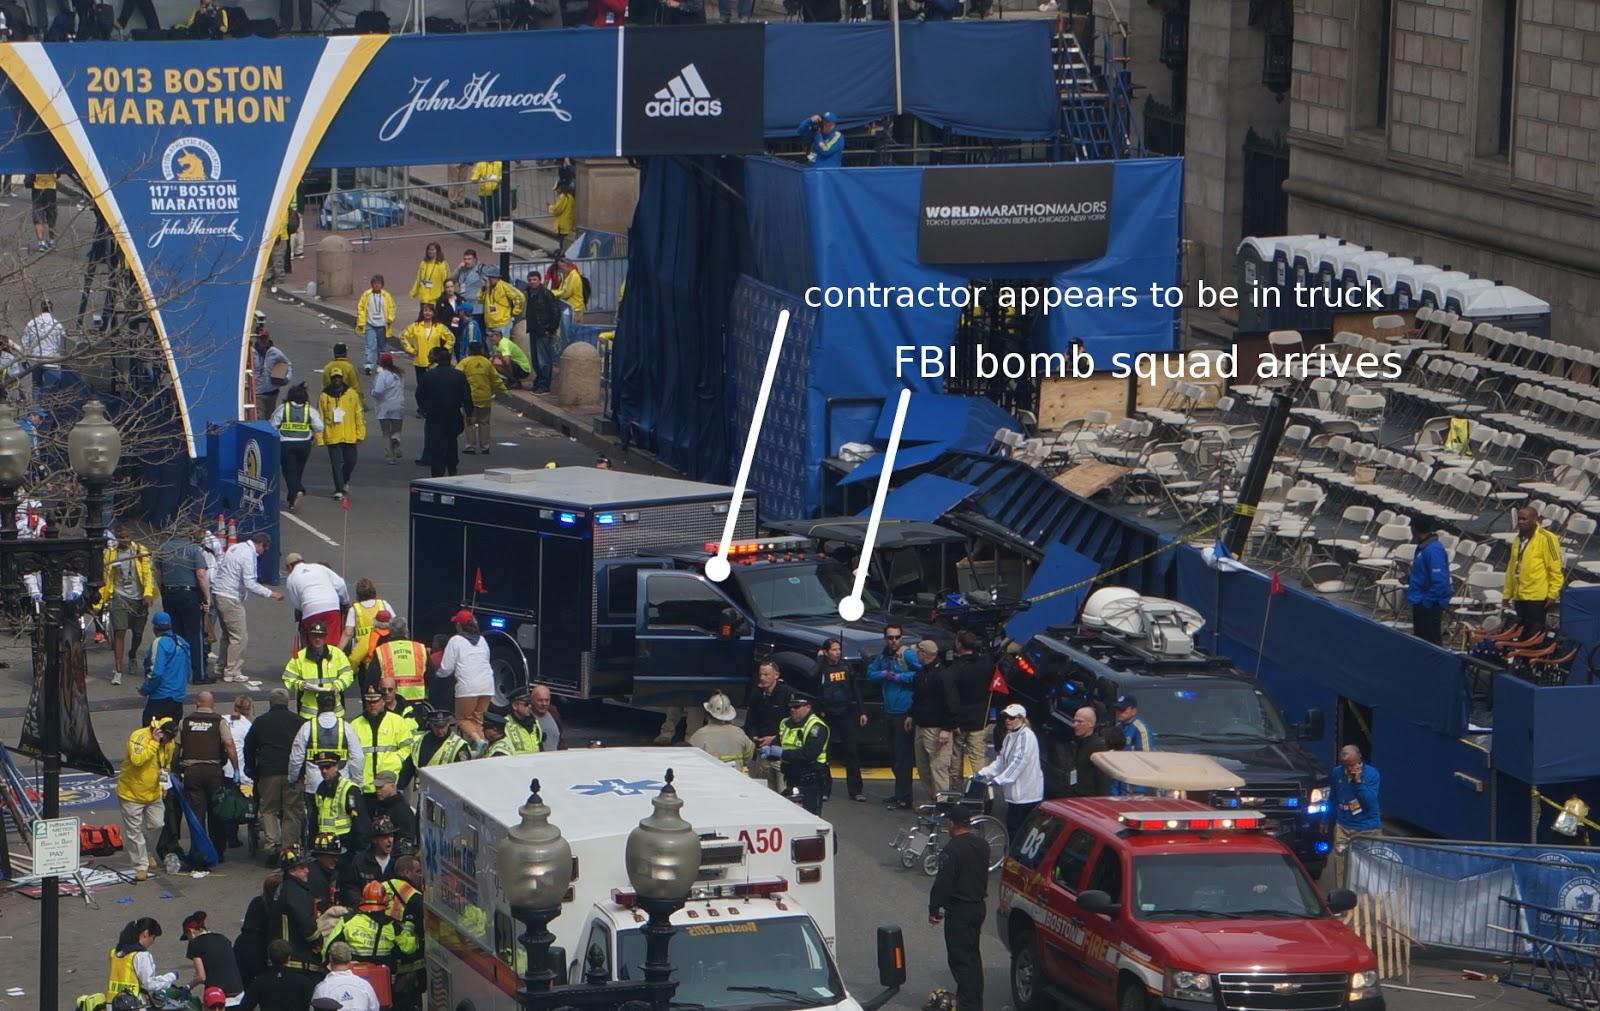 http://1.bp.blogspot.com/-v7CFtUlpn2w/UXD4kmlDbFI/AAAAAAAAHKE/faW233sYkz8/s1600/FBI_Arrives.jpg